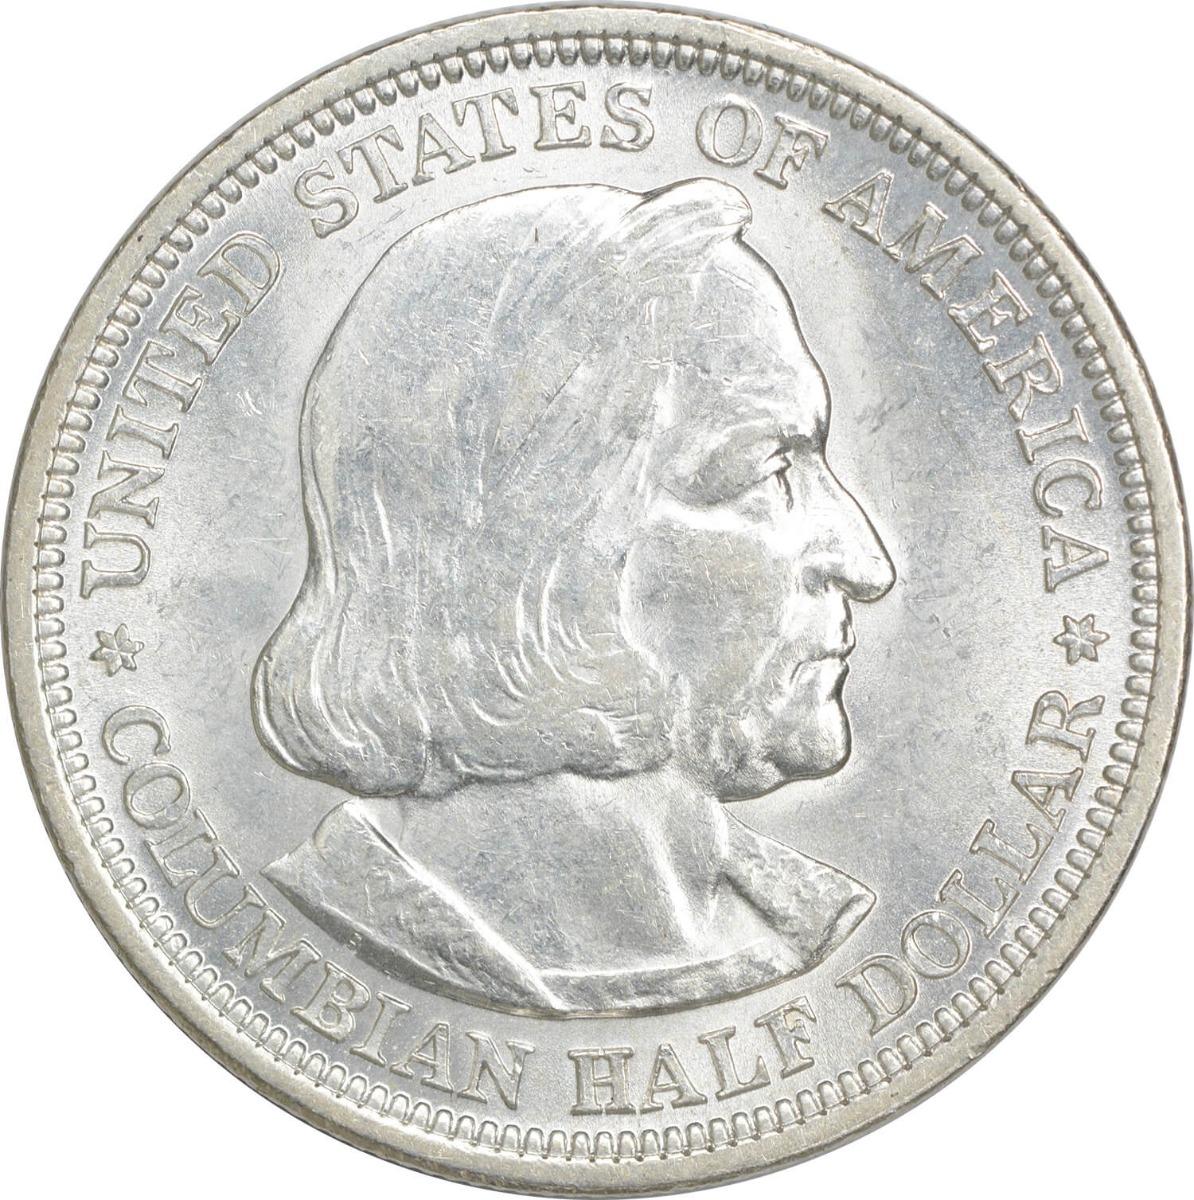 Columbian Commemorative Silver Half Dollar 1893 MS63 Uncertified